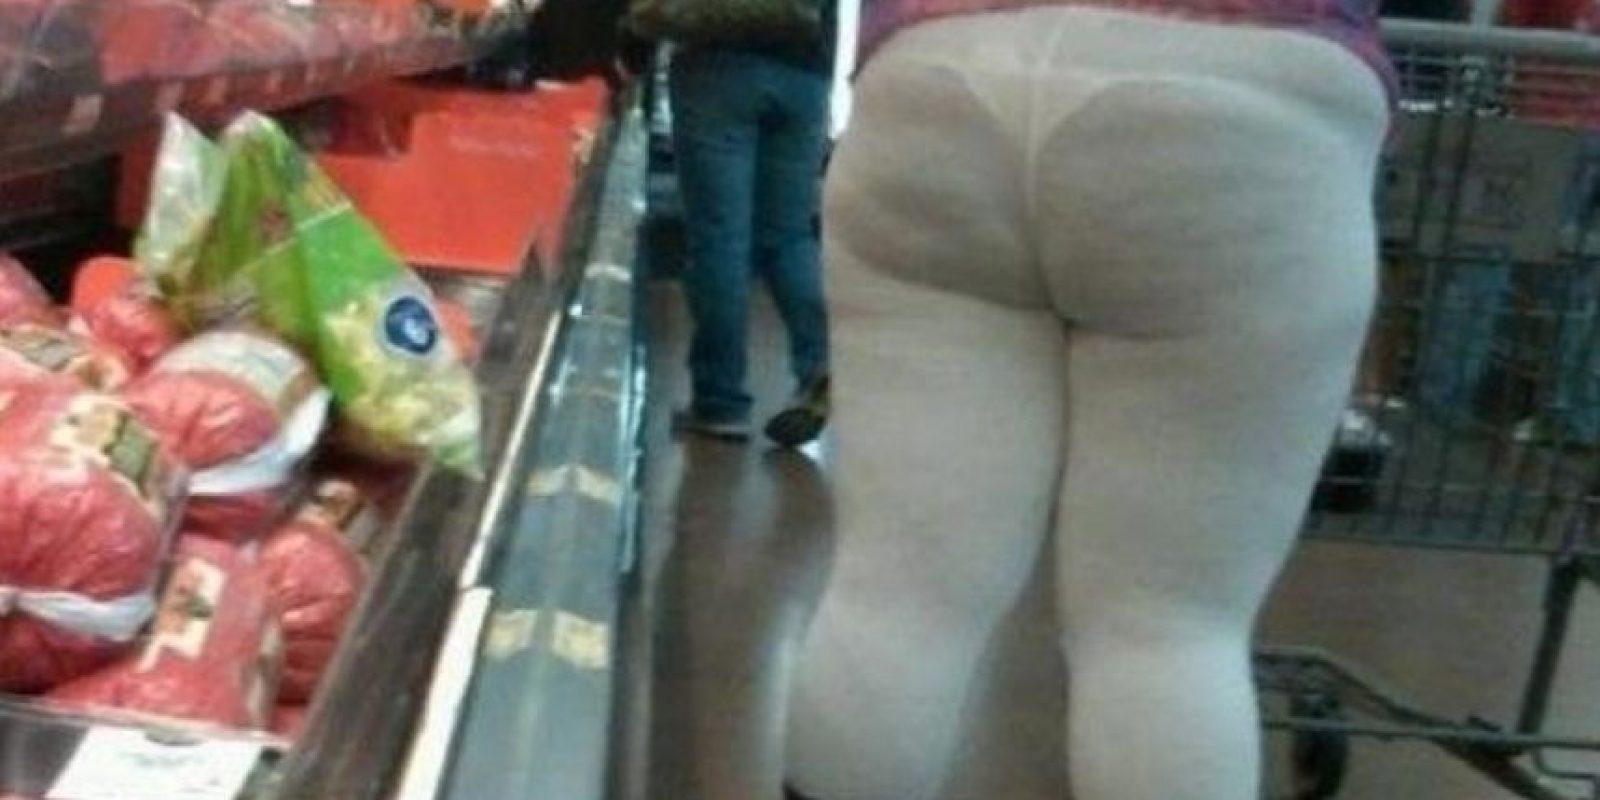 Esos leggins tan problemáticos para algunas… Foto:Funny Pics